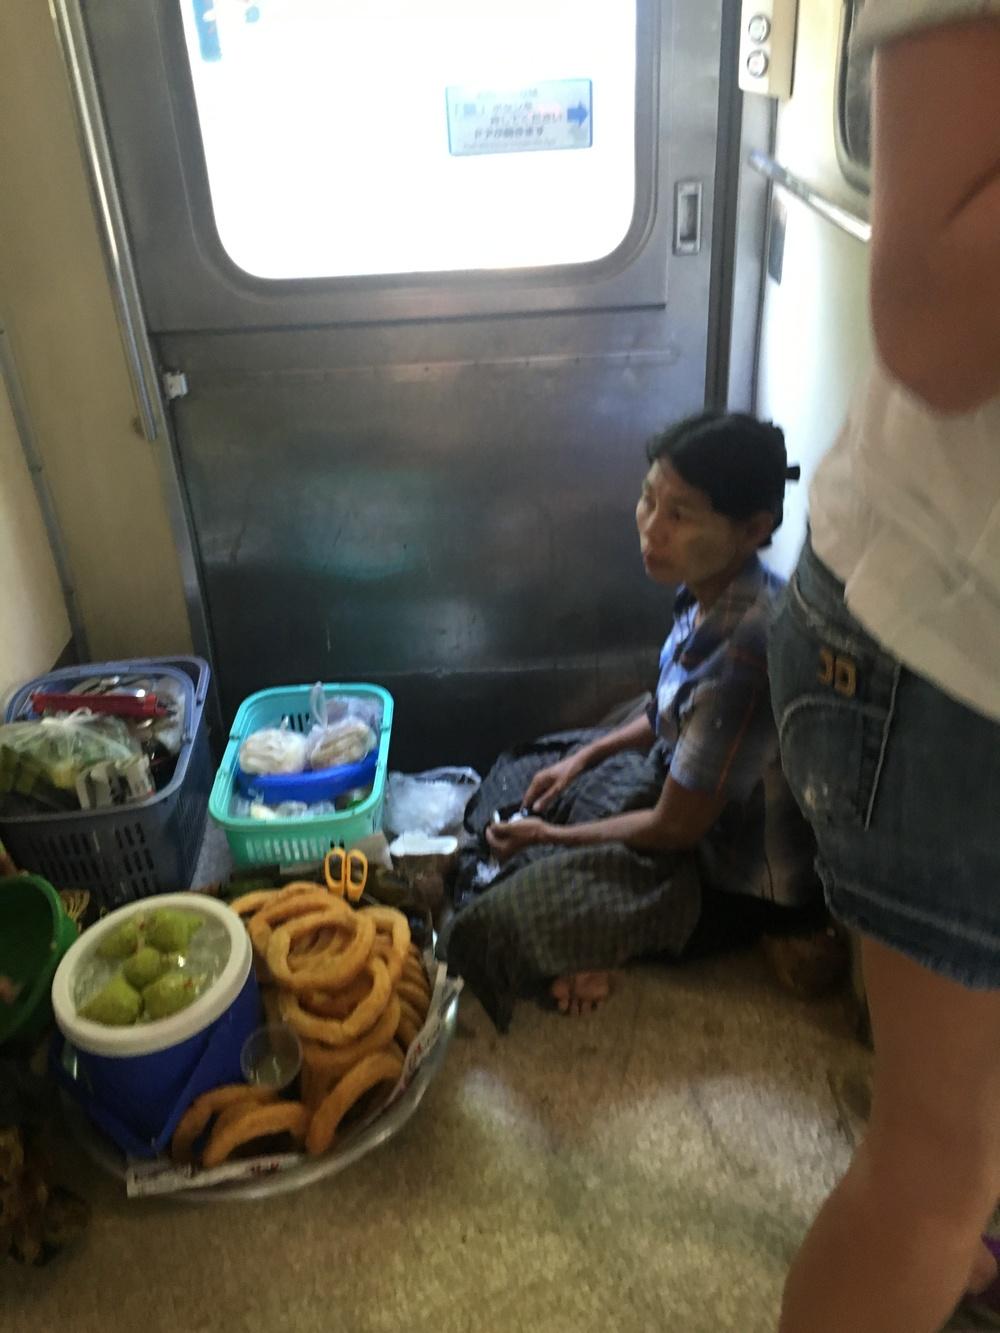 Train snacks